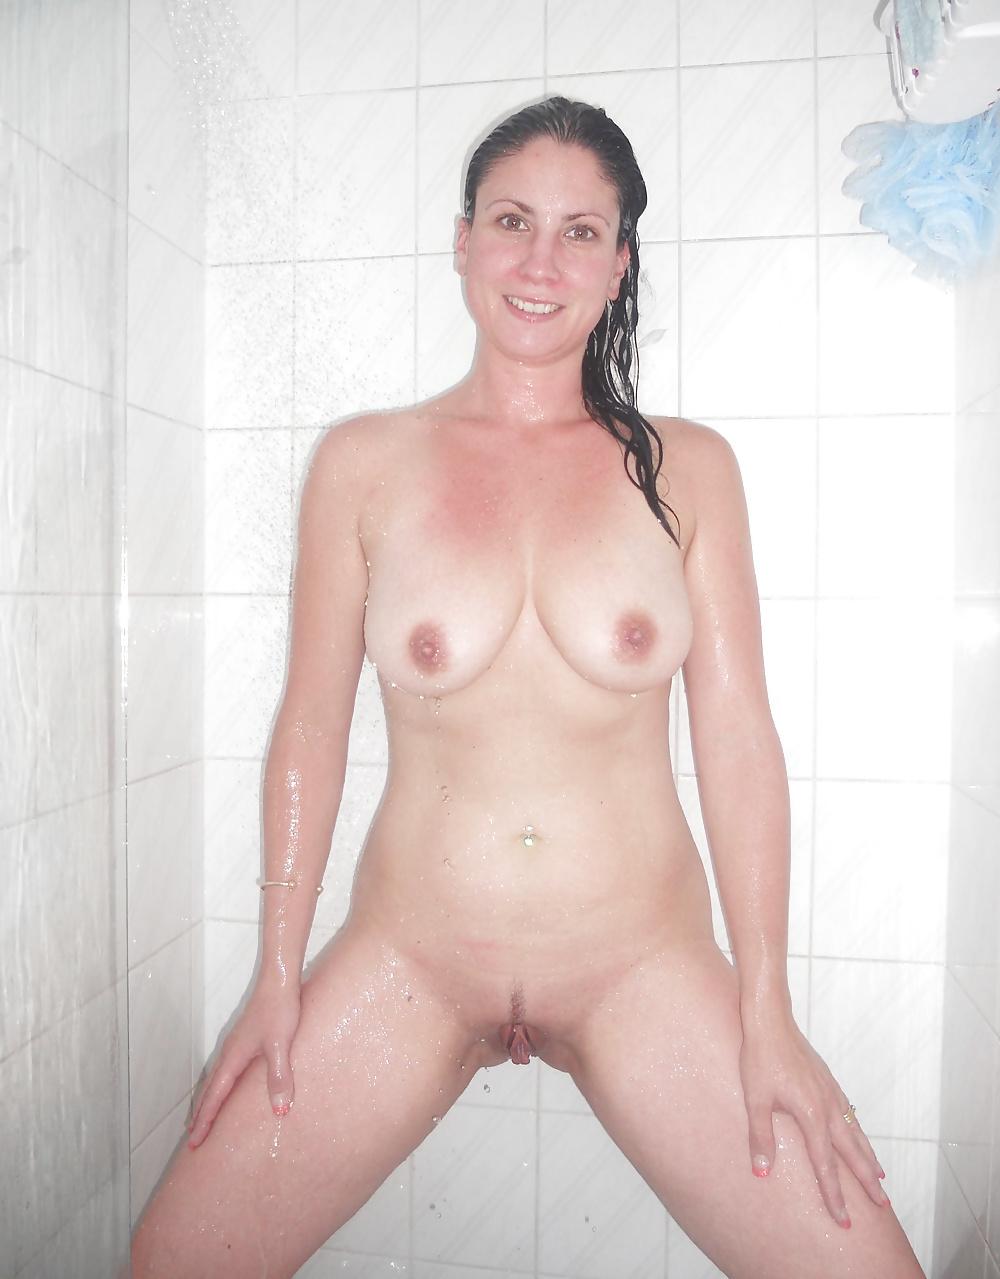 cougar du 22 en photo sexe rencontres matures